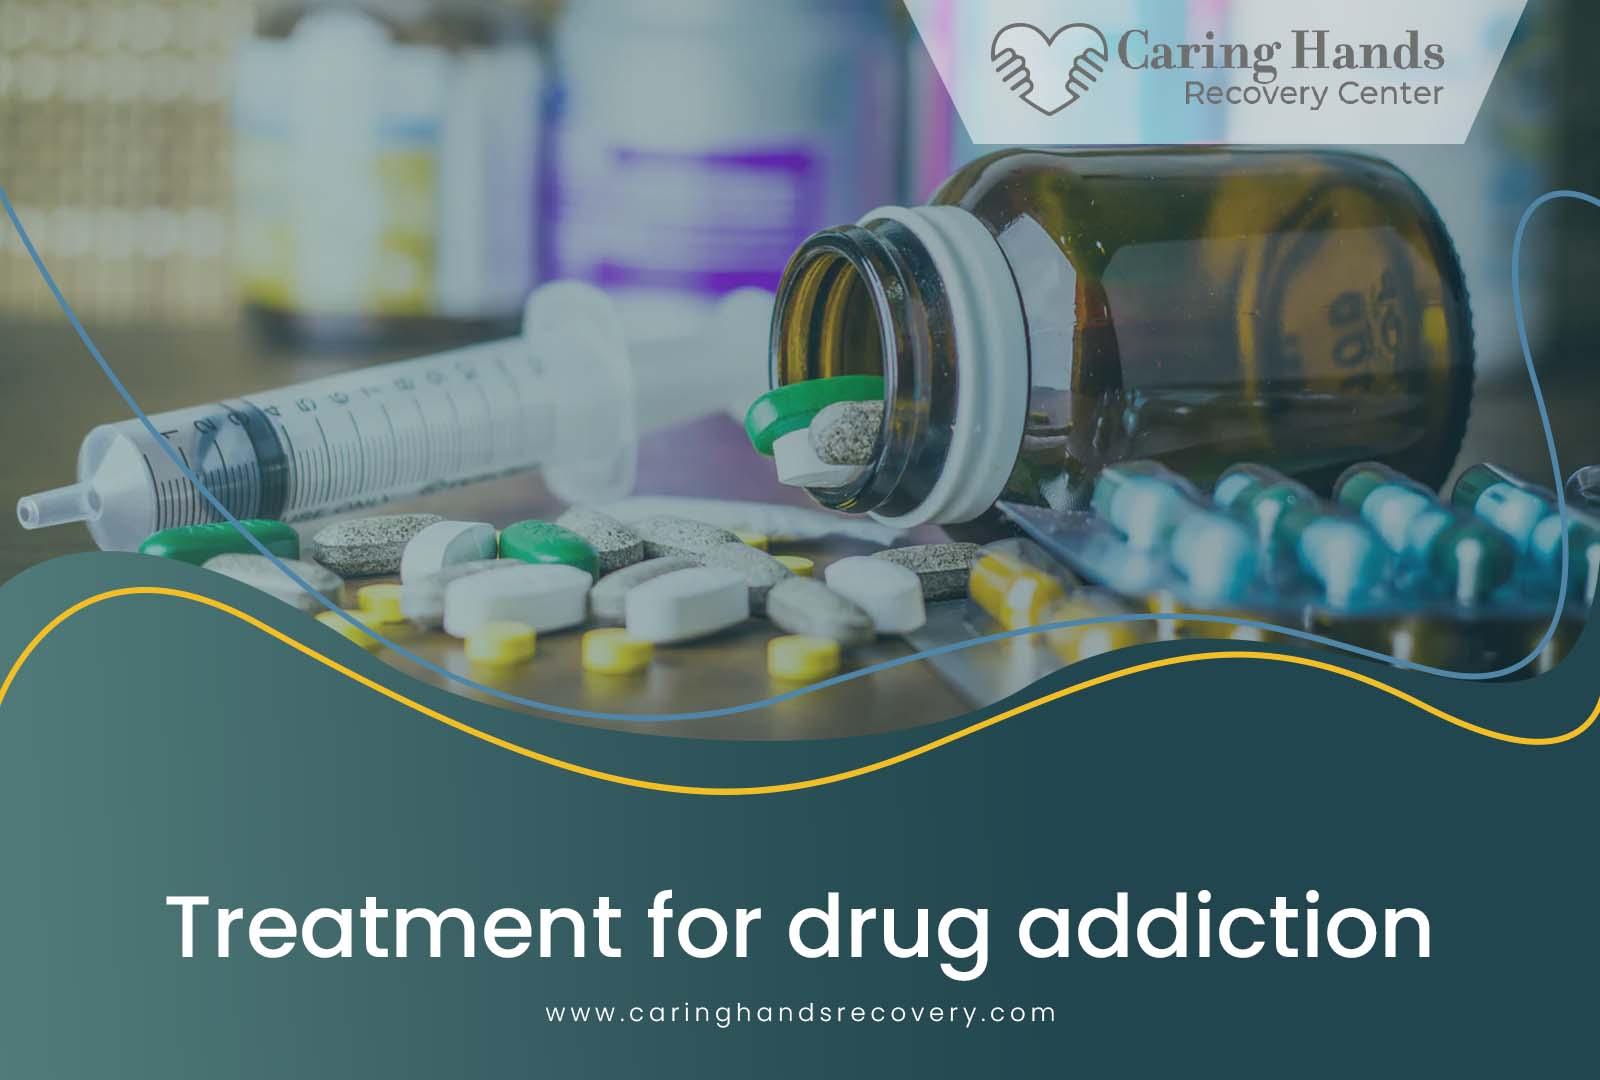 Treatment for Drug Addiction